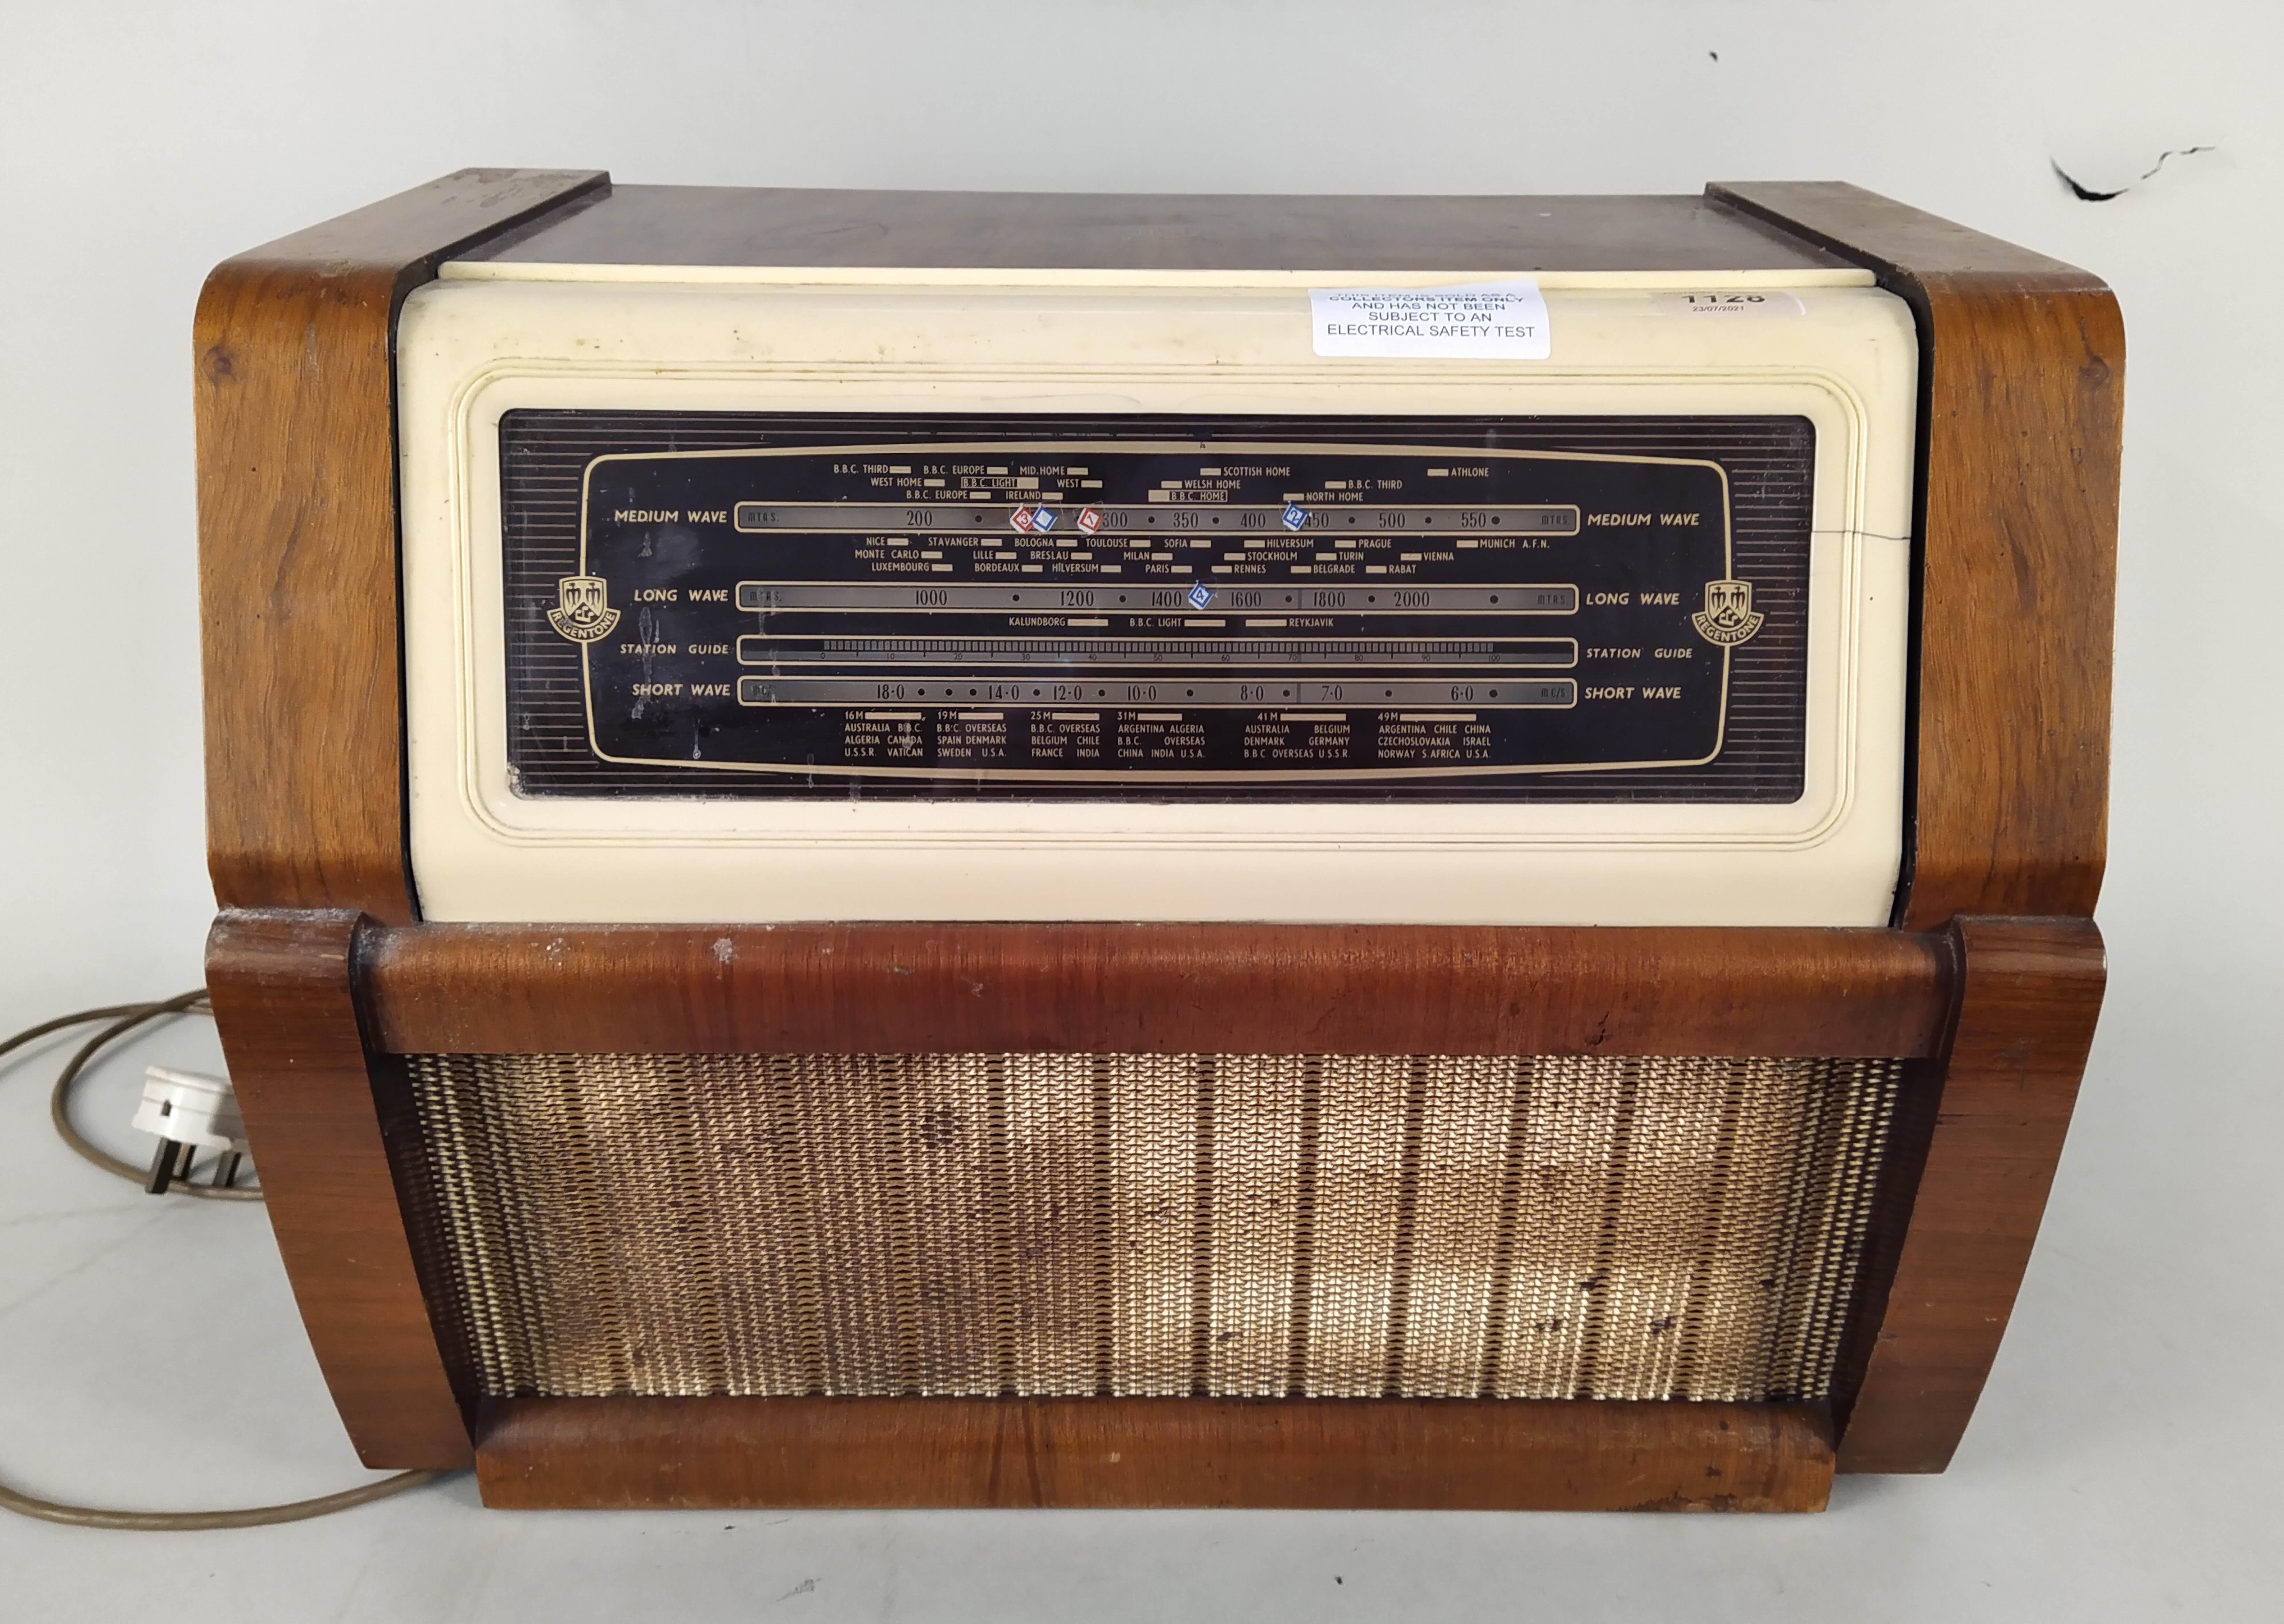 A large vintage 'Regentone' transistor radio